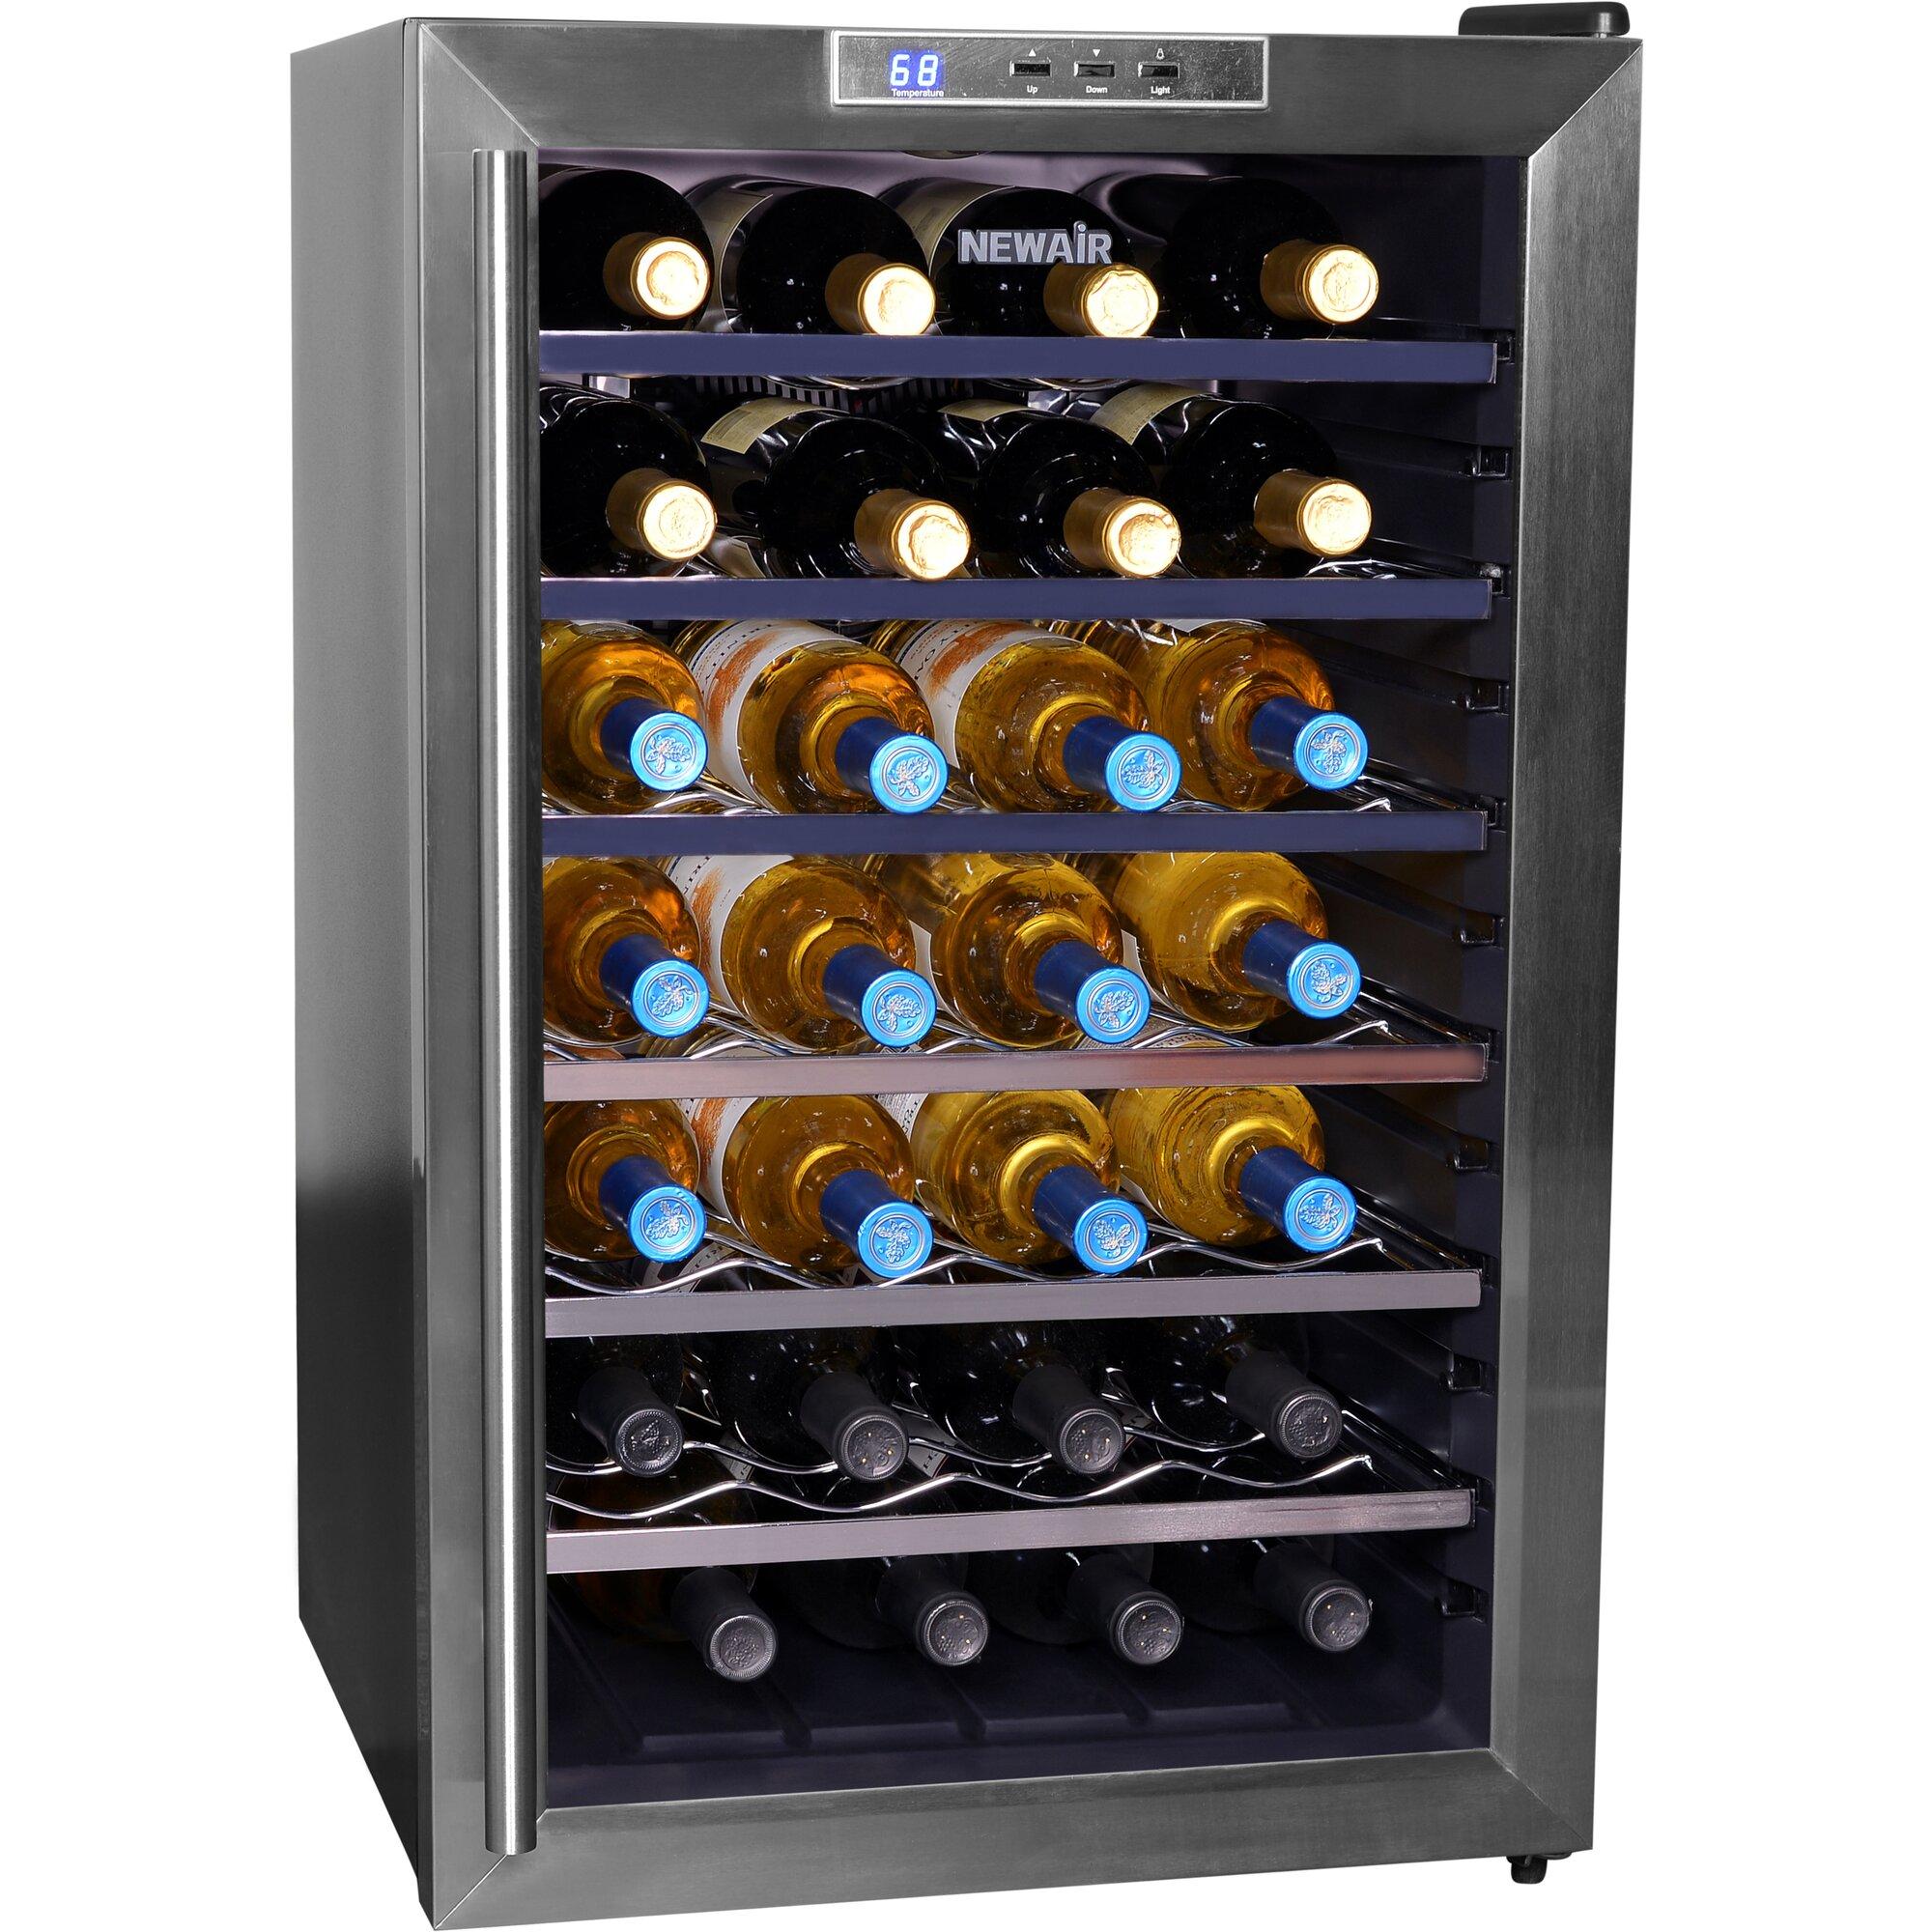 newair 28 bottle single zone freestanding wine cooler reviews wayfair. Black Bedroom Furniture Sets. Home Design Ideas